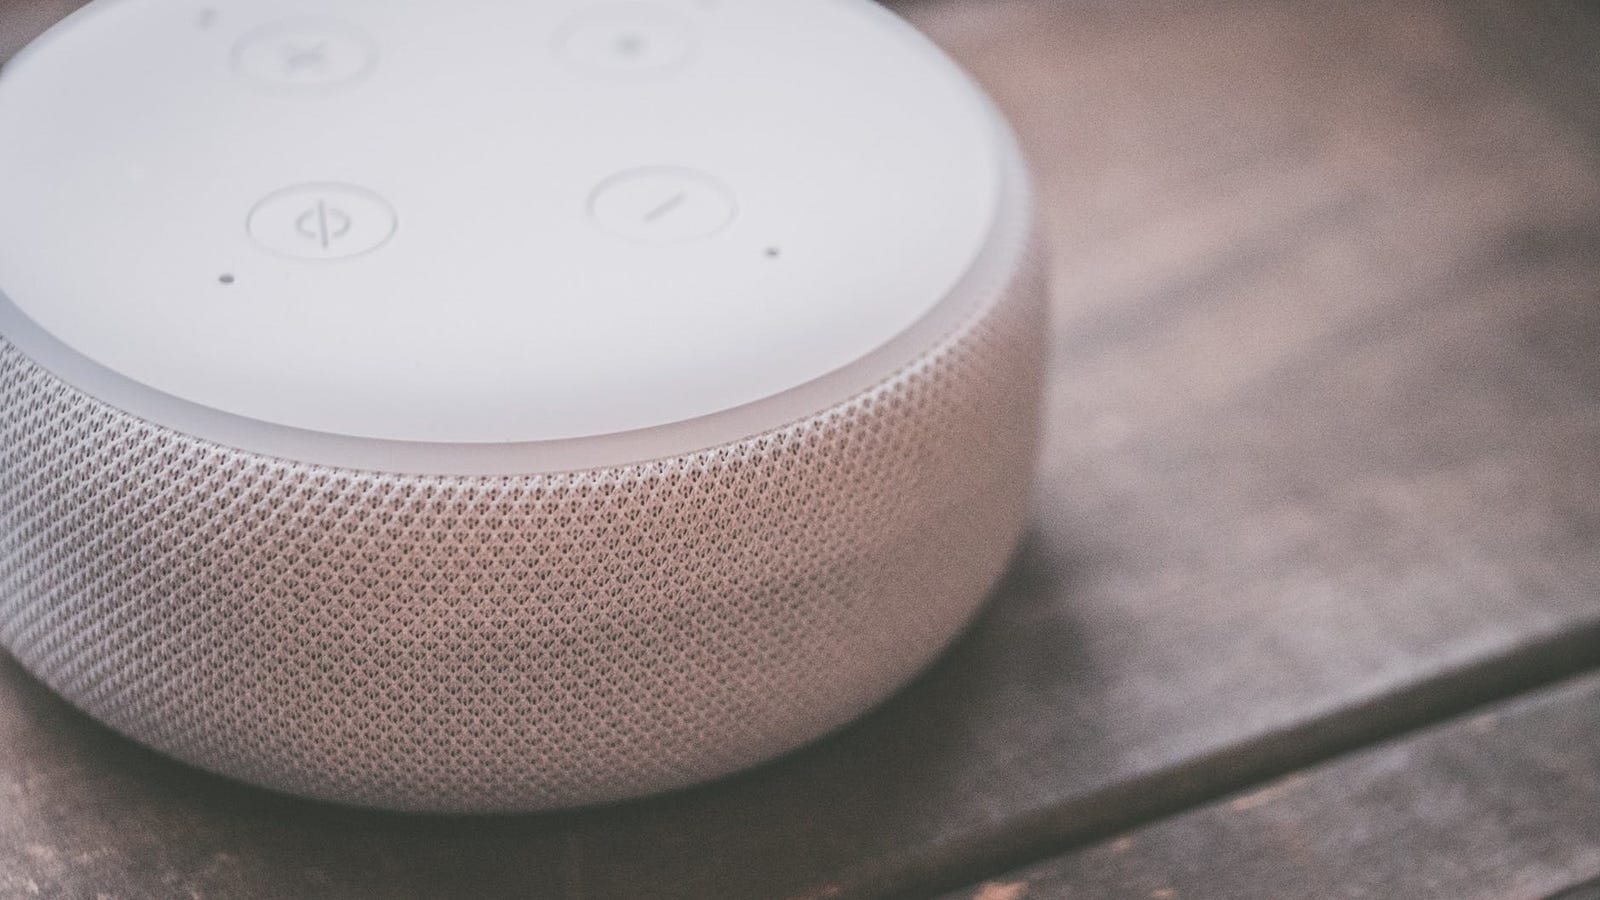 Listen to Amazon Music or YouTube Music For Free Through a Smart Speaker - Lifehacker